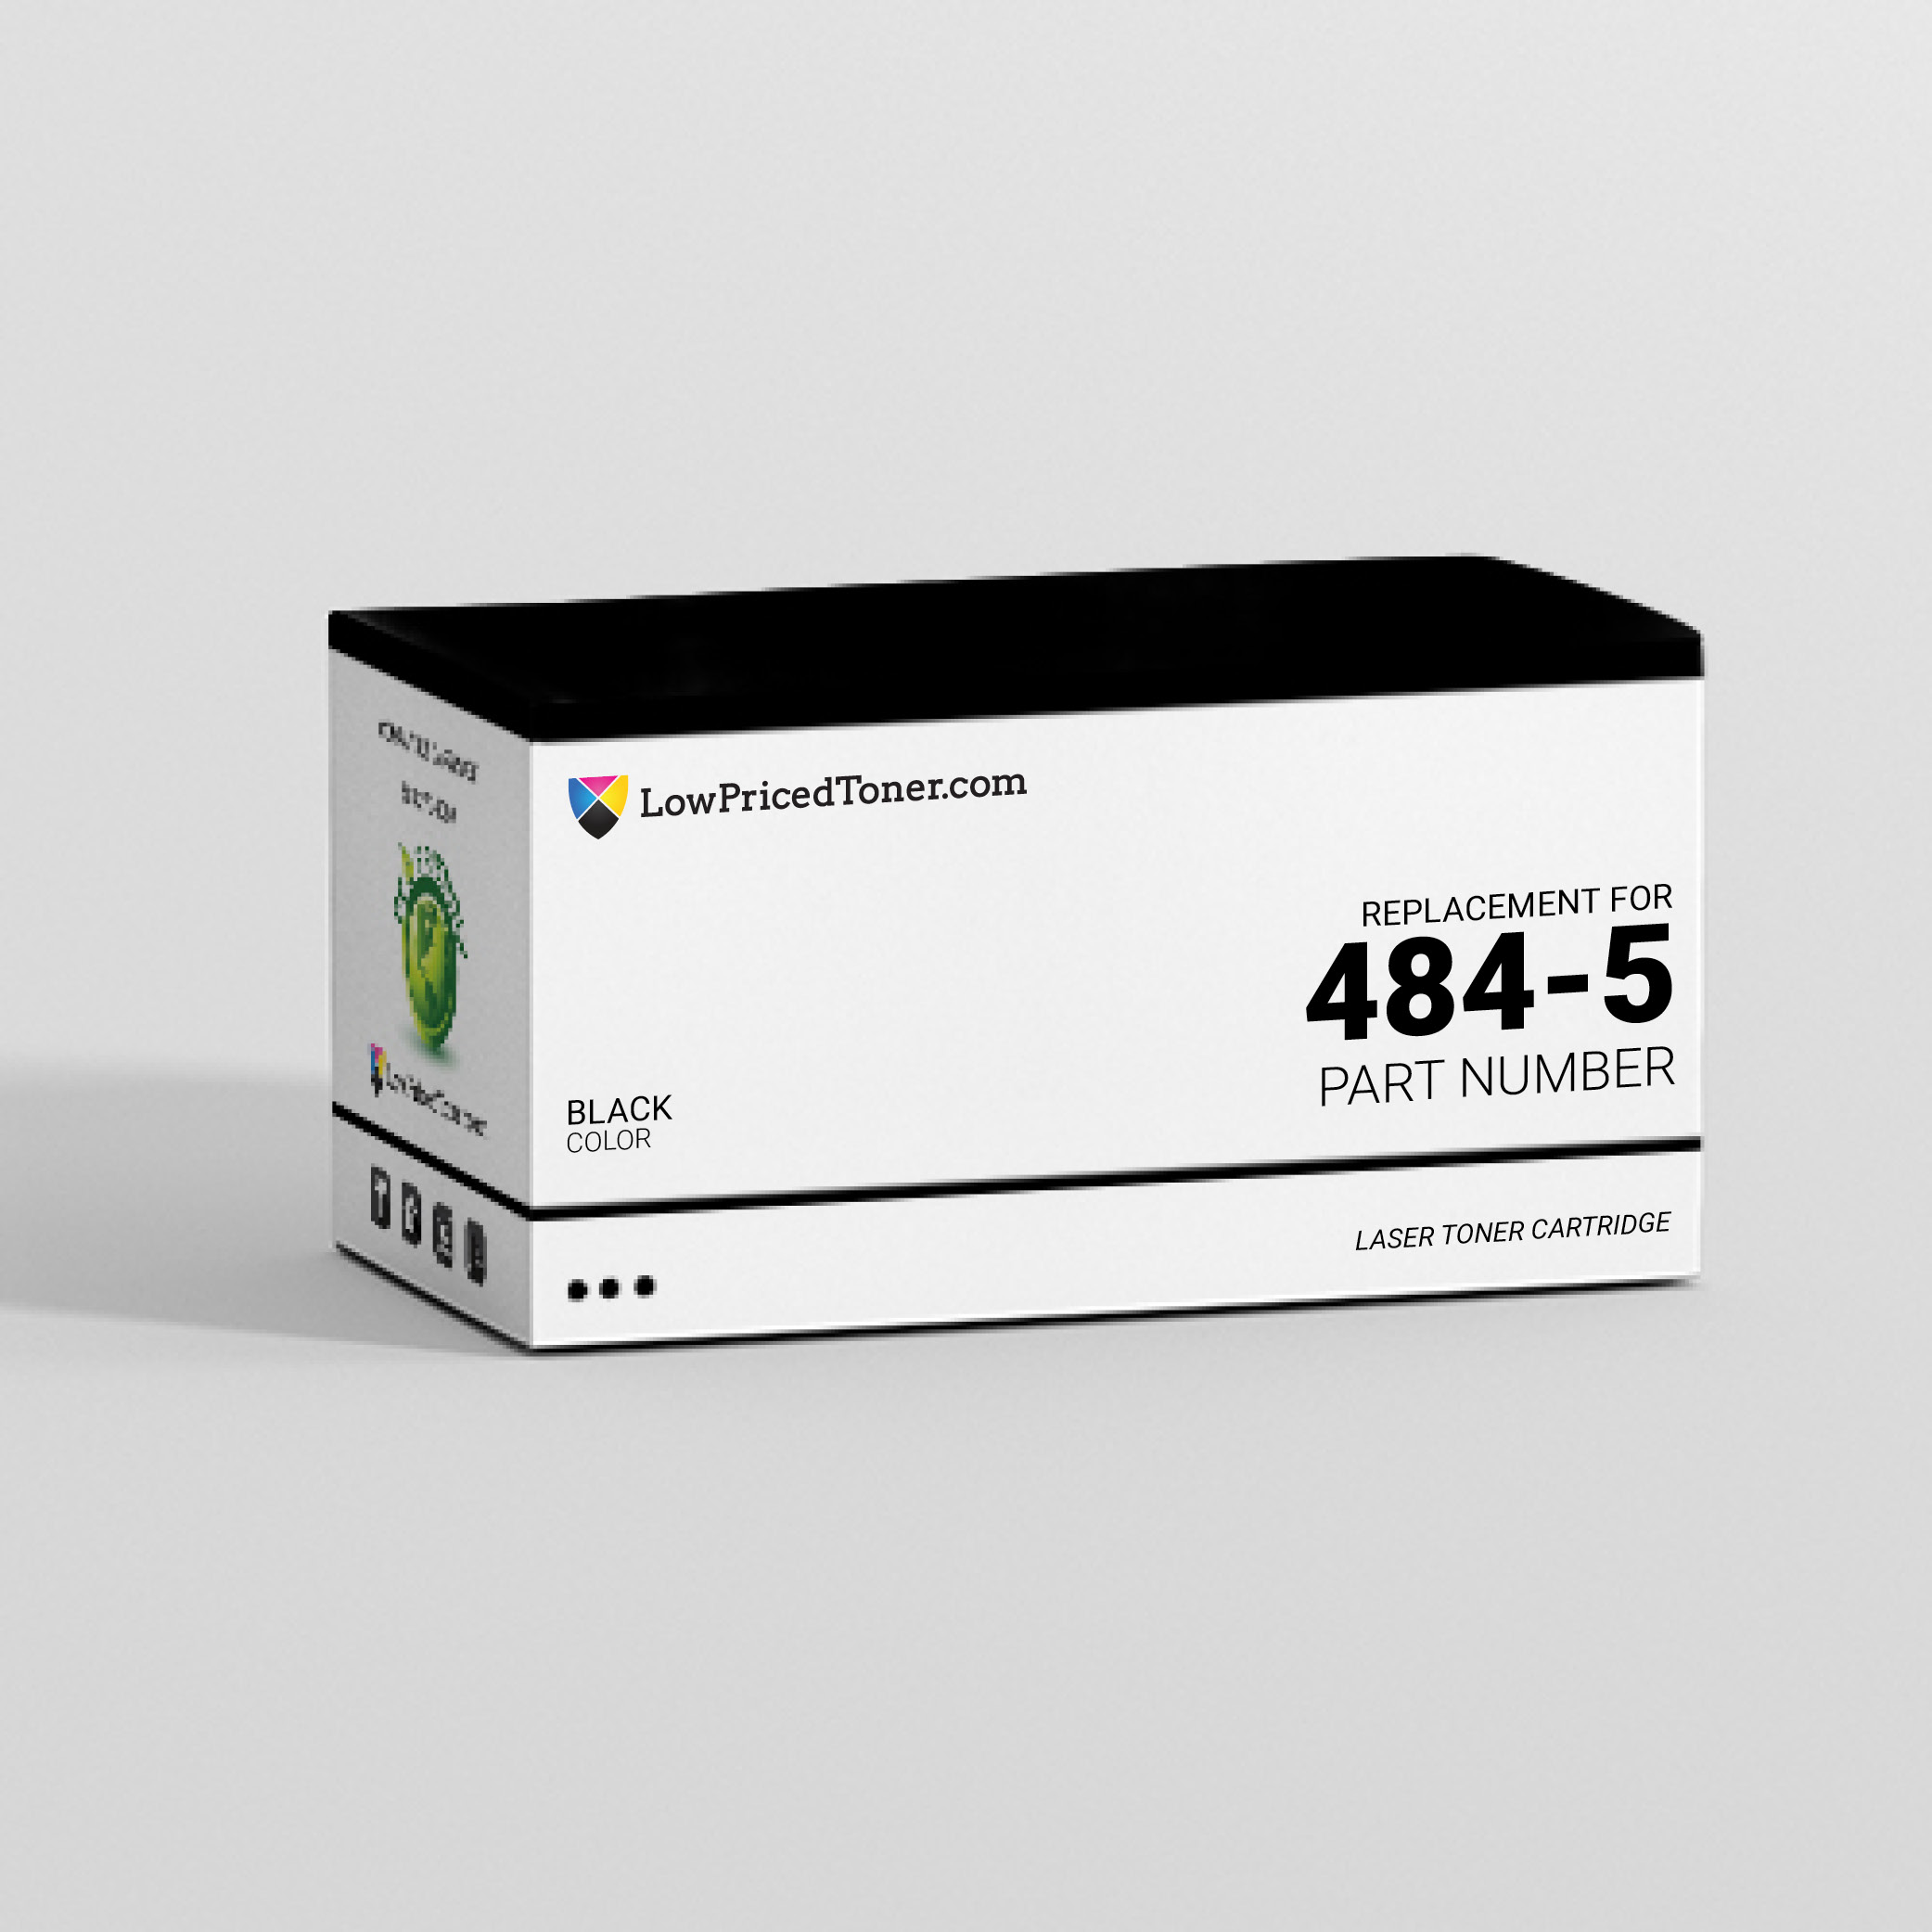 Imagistics and Pitney Bowes 484-5 Compatible Black Laser Toner Cartridge